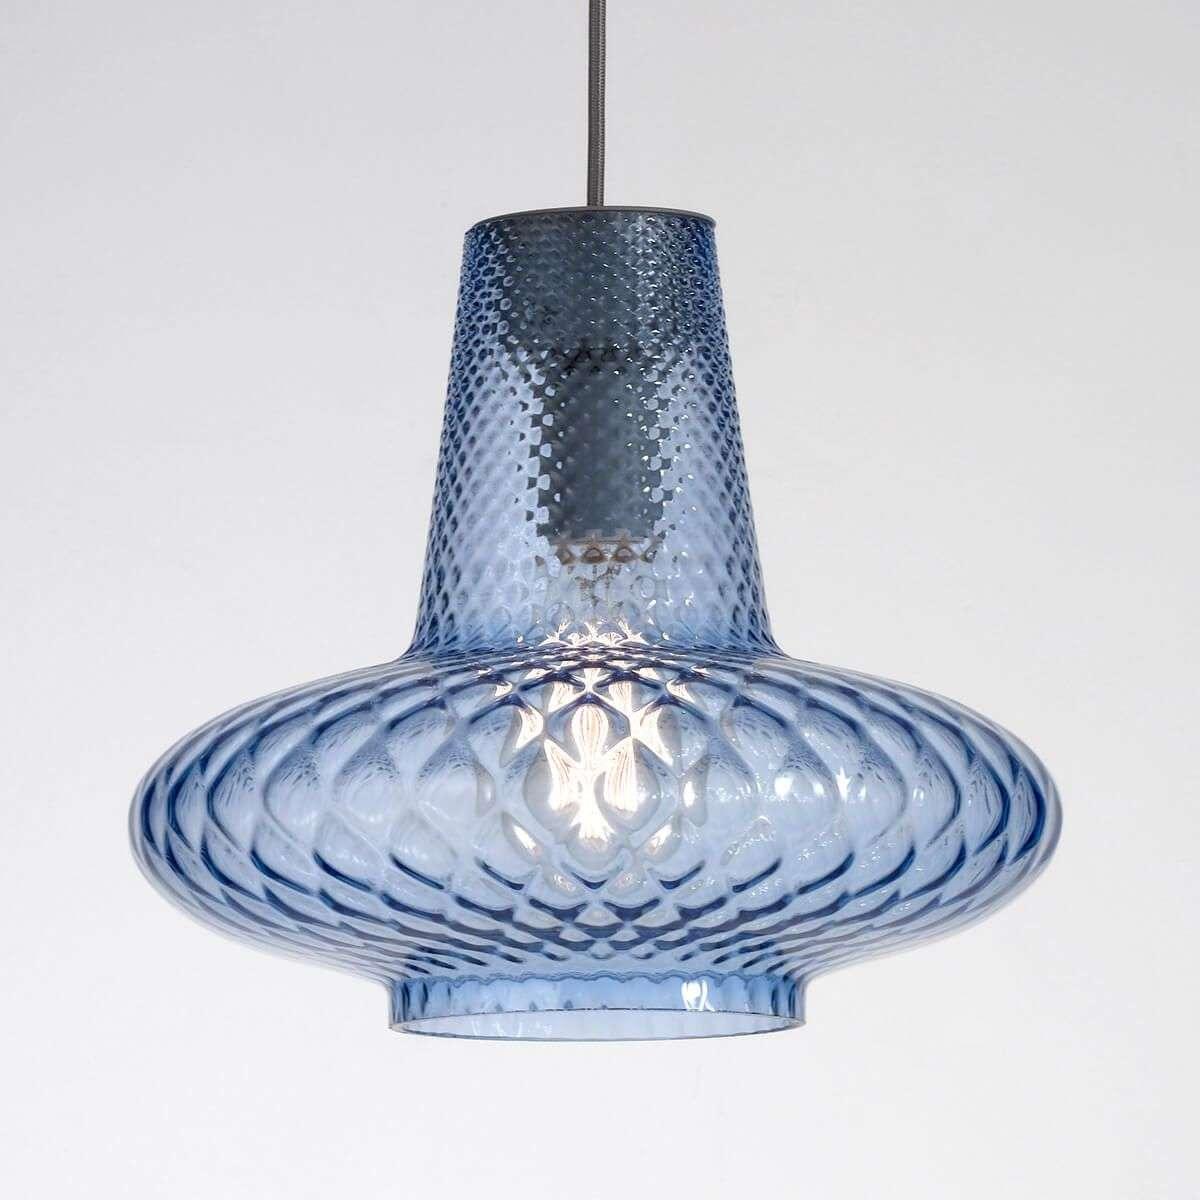 Extraordinary Glass Pendant Lamp Giulietta Blue 1053269 31